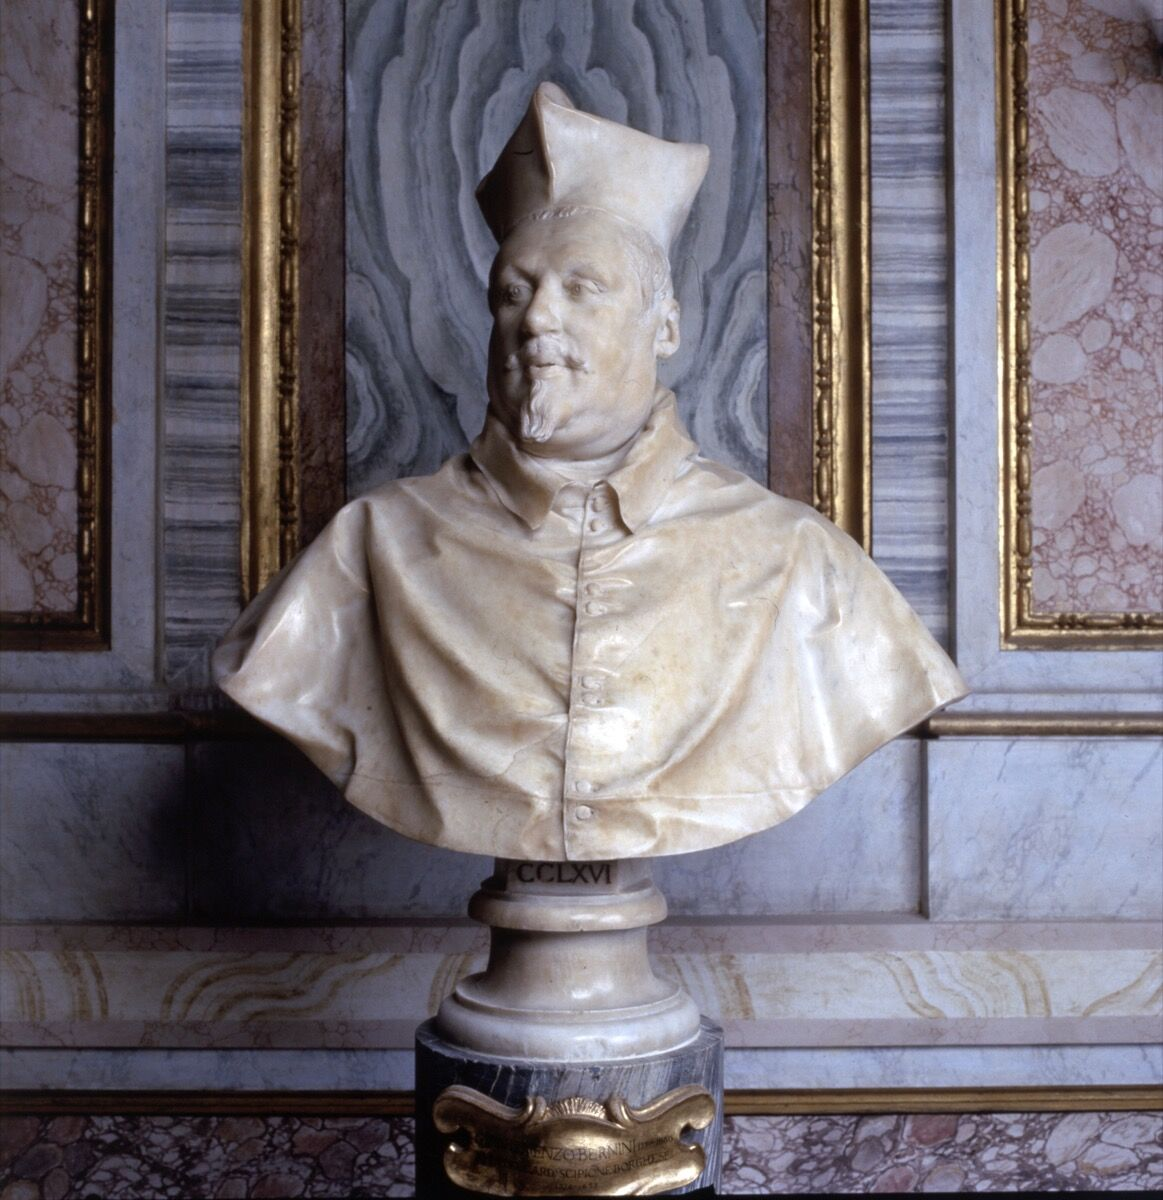 Gian Lorenzo Bernini, Bust of Cardinal Scipione Borghese, 1632. Courtesy of Galleria Borghese.